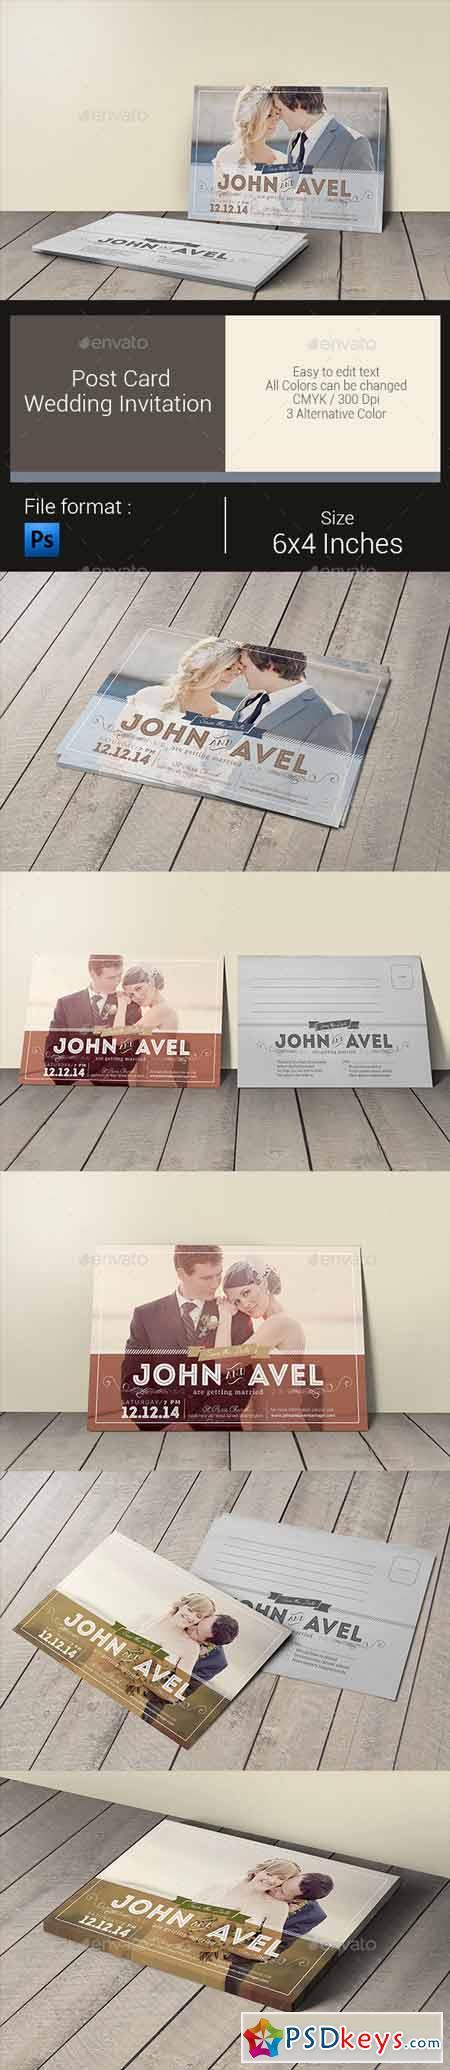 Post Card Wedding Invitation 10547726